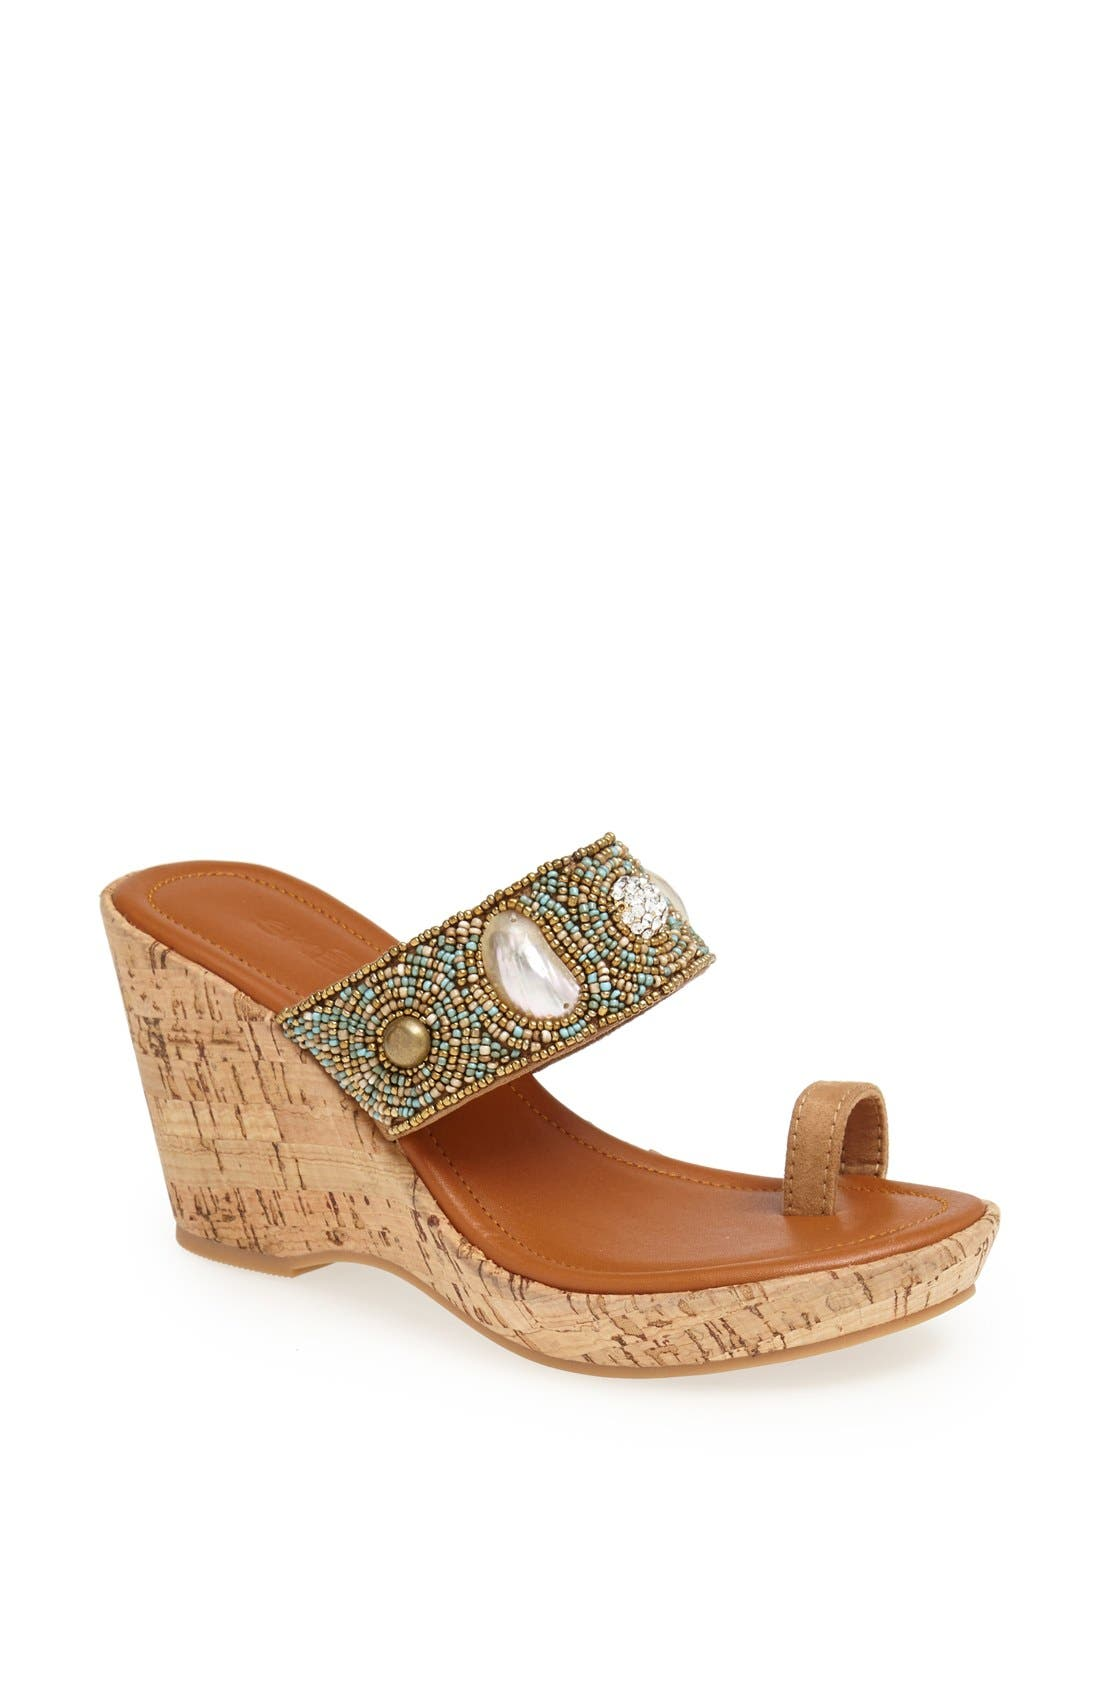 Main Image - Skemo 'Luzia' Sandal